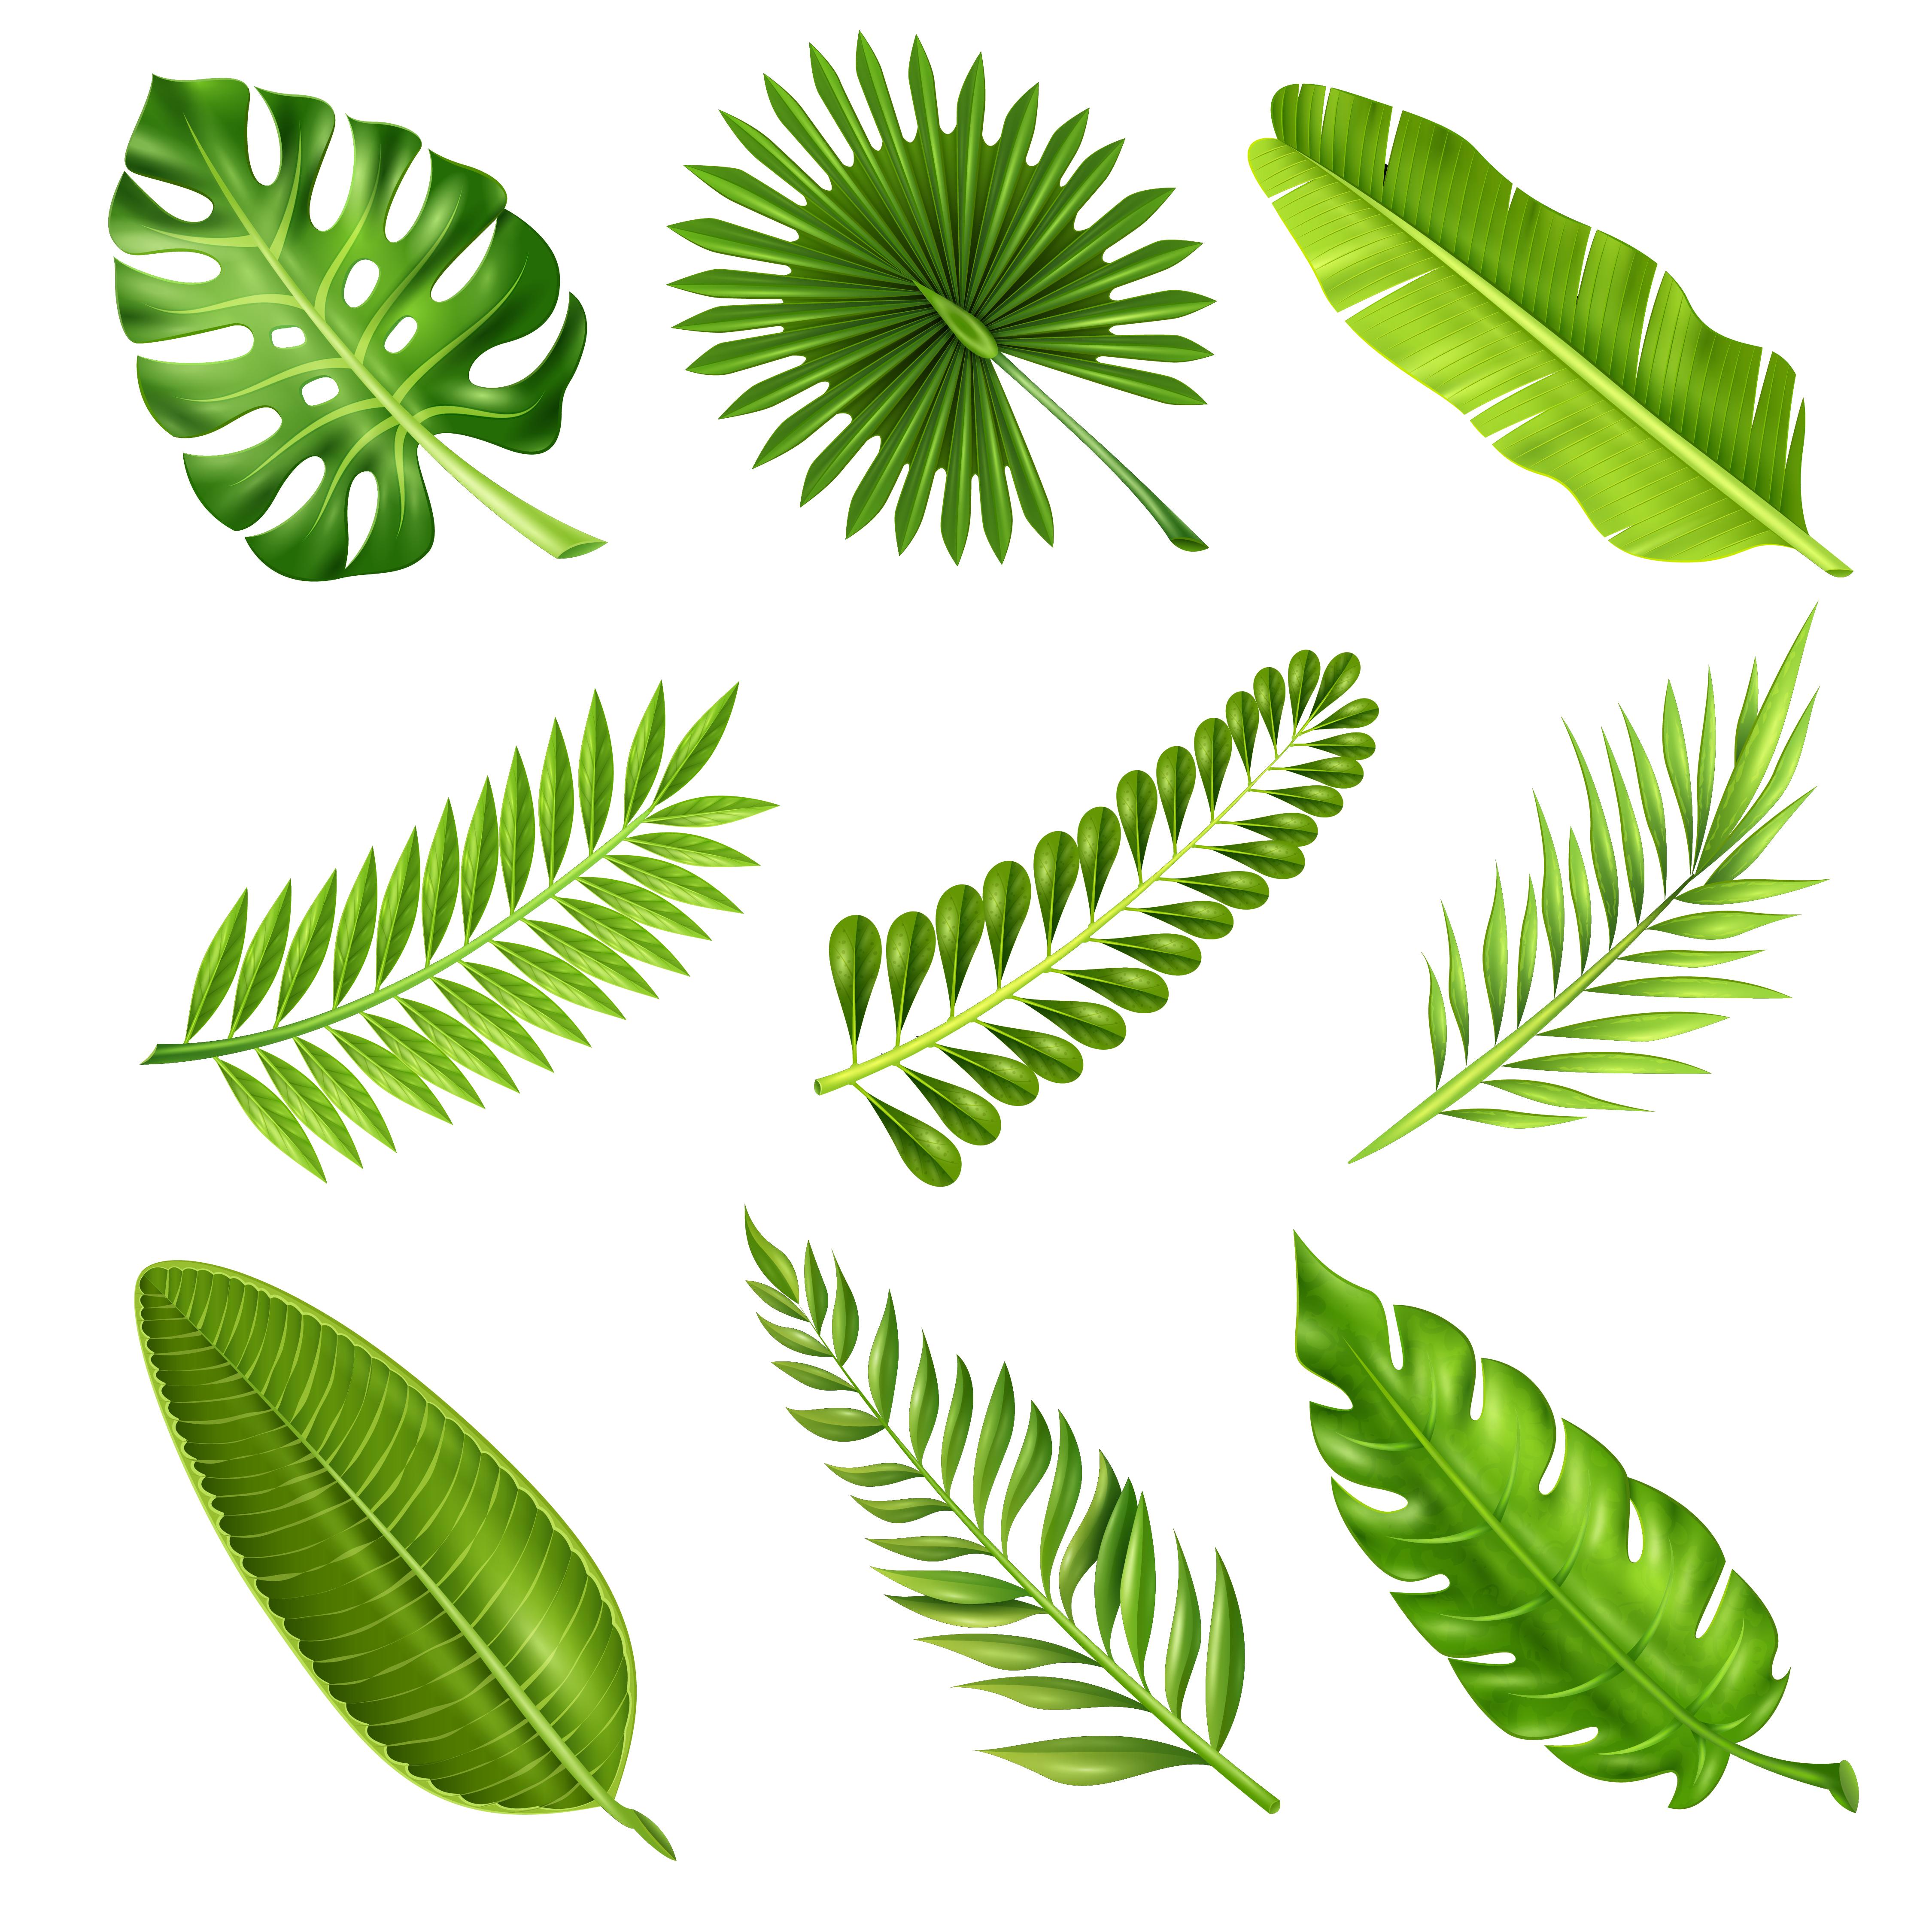 Pashudhan and Animal Science : Palm tree - Symbol of